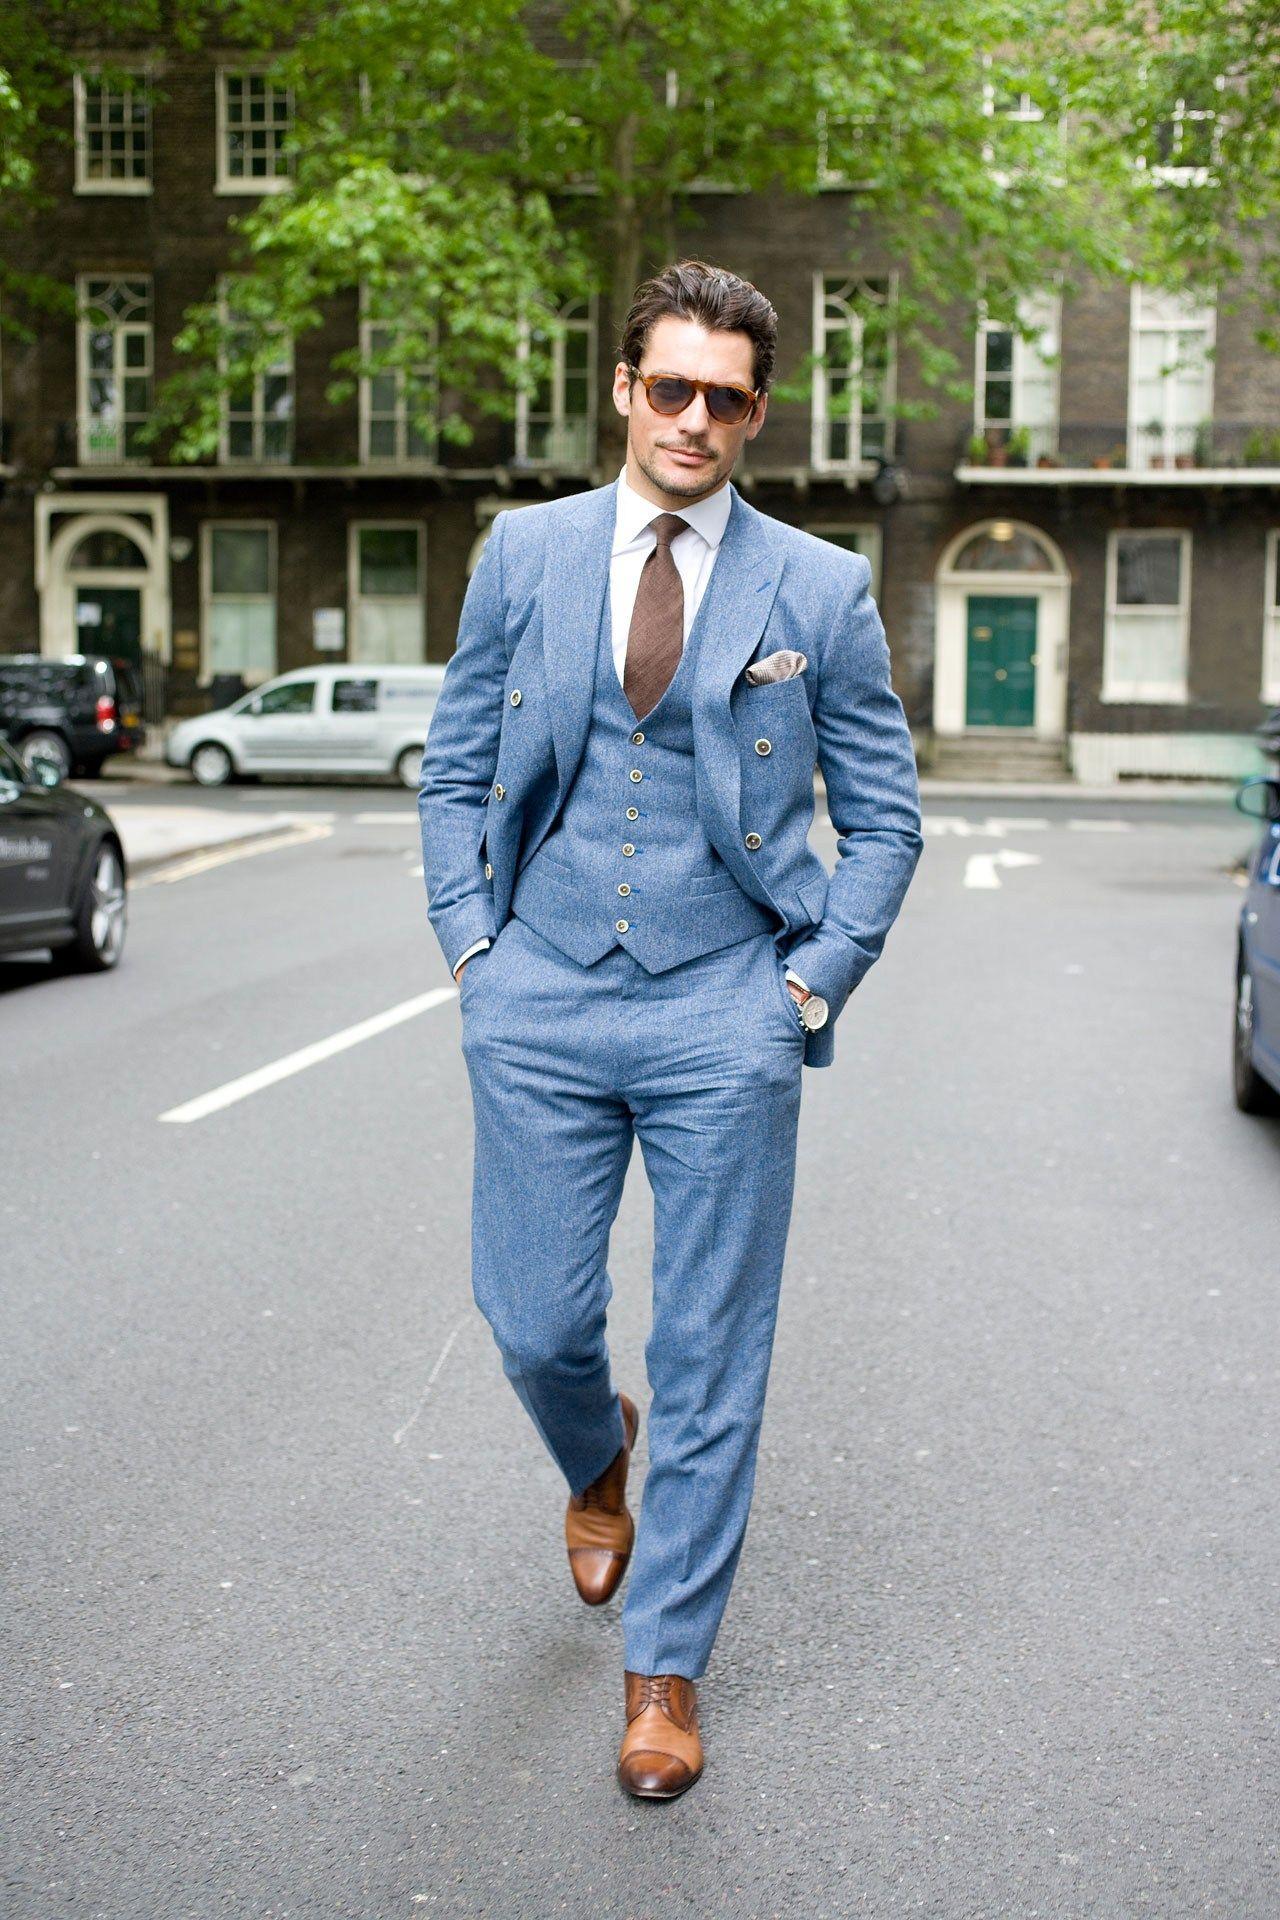 male-models-street-style-2013-elegant-wear-for-men-8.jpg 1,280×1,920 ...